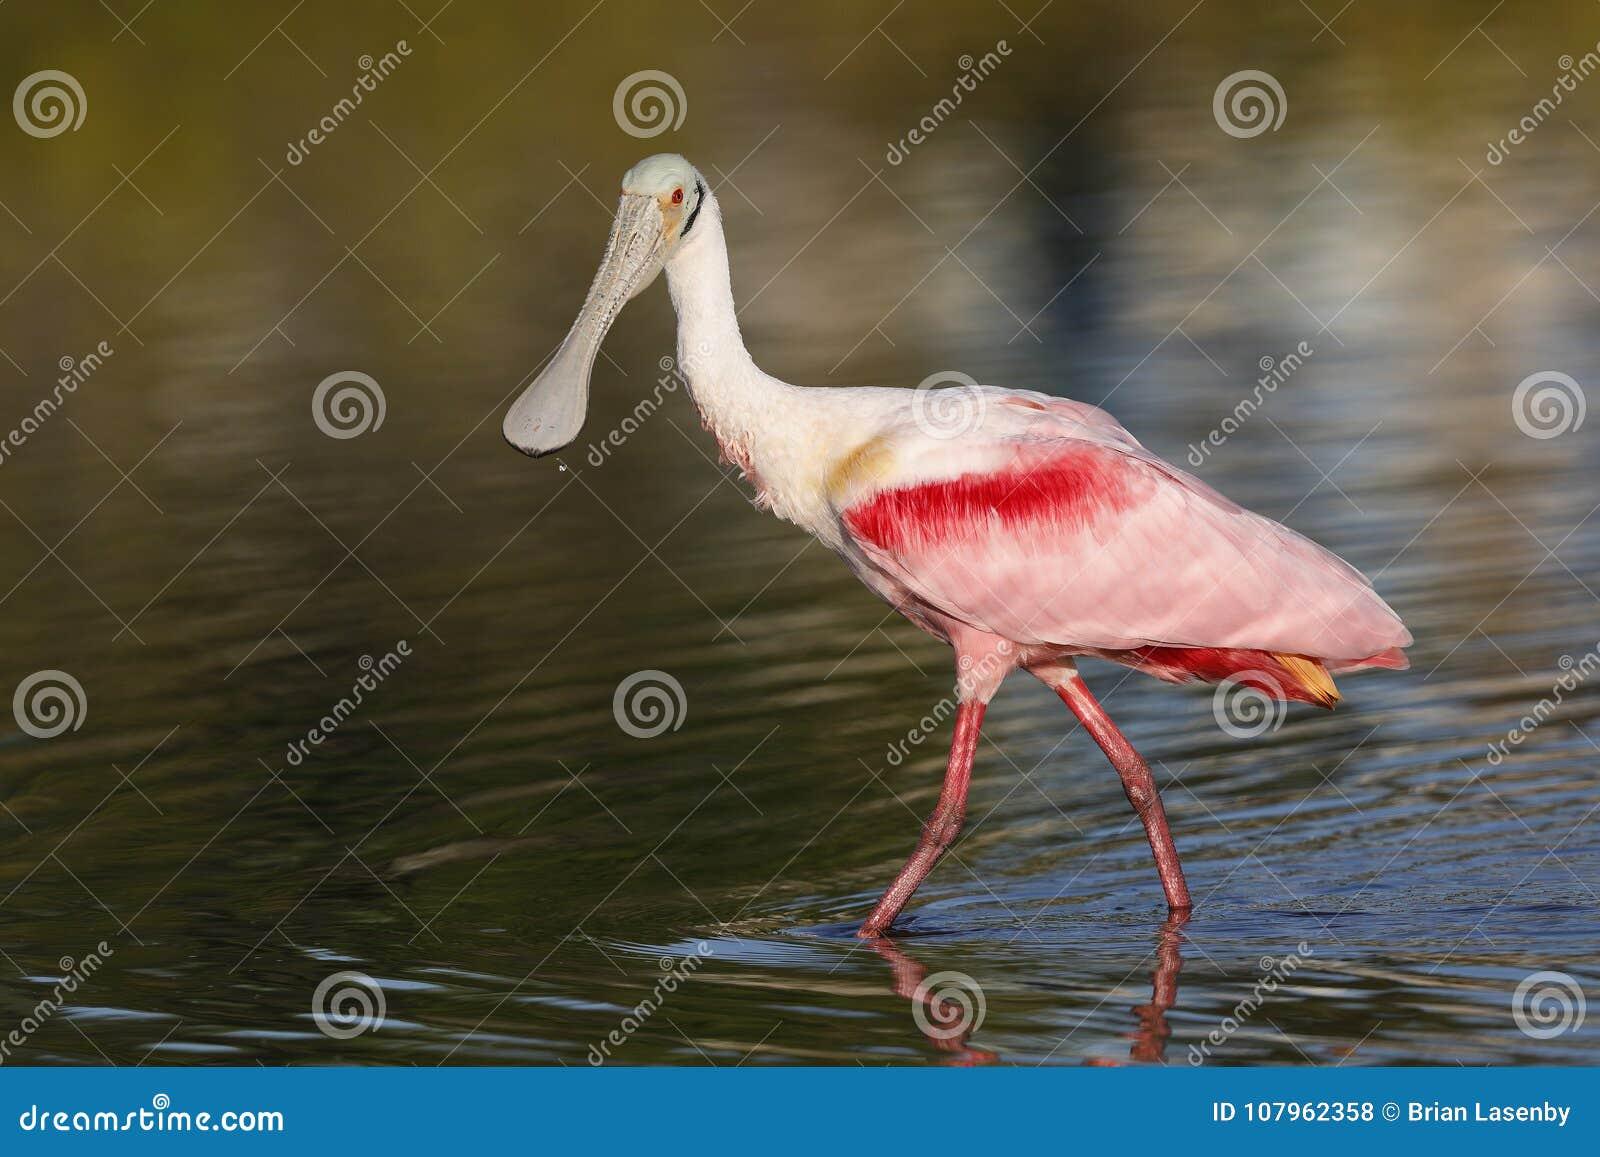 Roseate колпица - охраняемая природная территория острова Меррита, Флорида